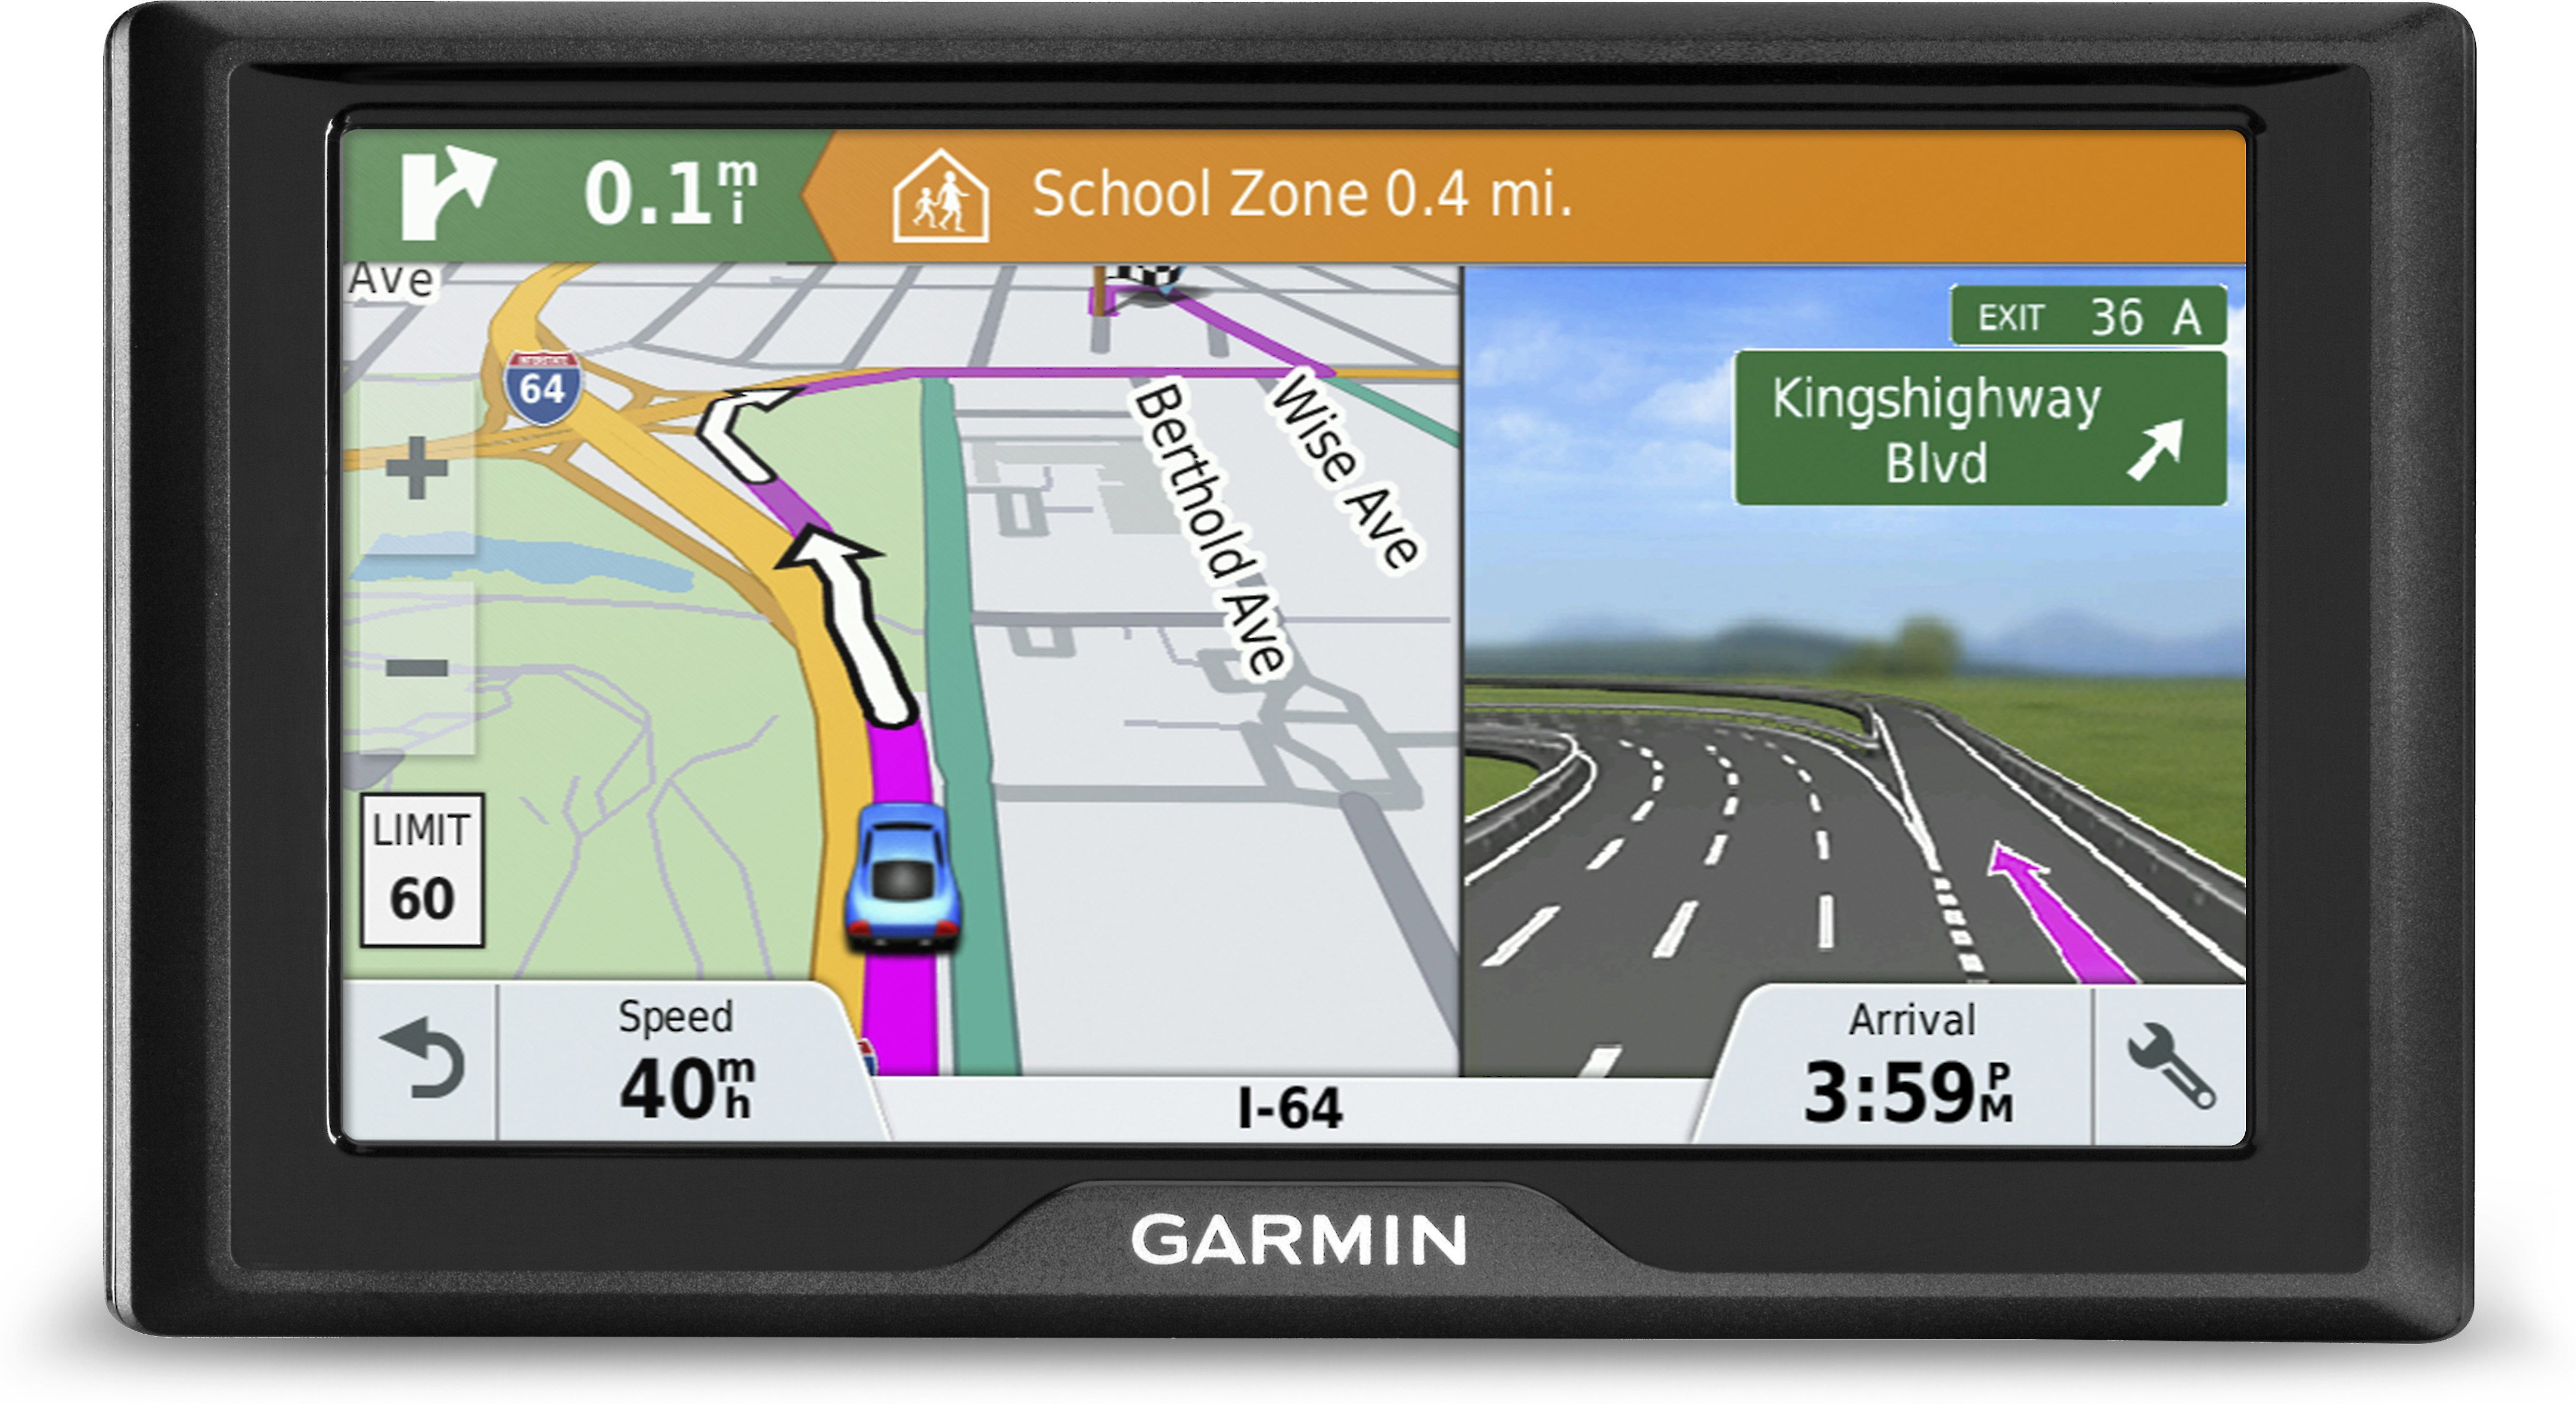 How To Get Free Garmin Map Update Gps Update Guide >> Garmin Drive 61 Lmt S